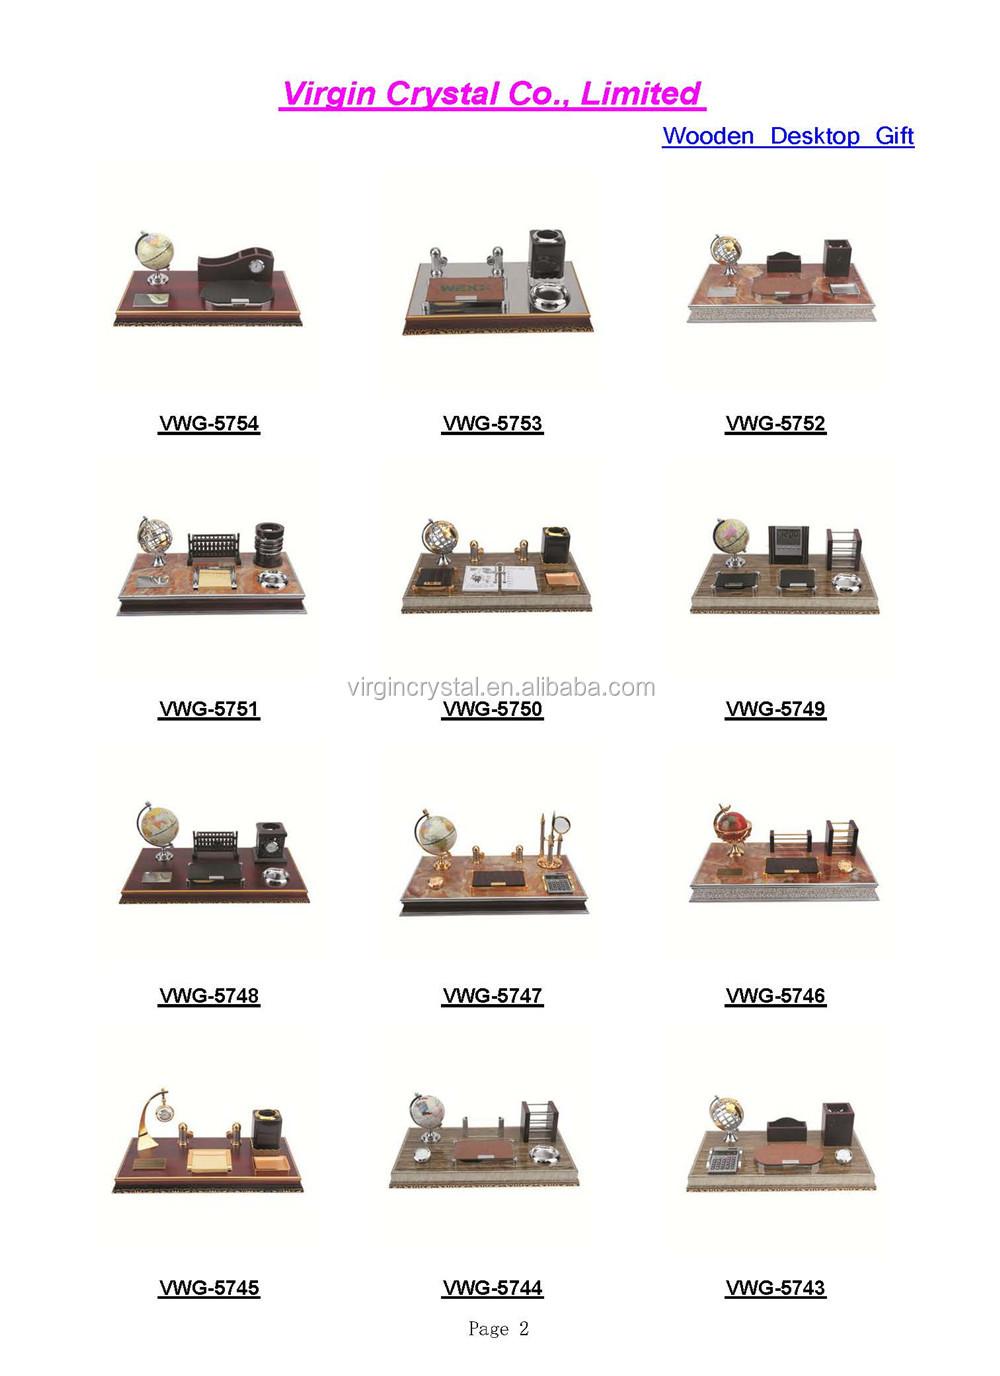 FILE20170407141228808.pdf__02.jpg